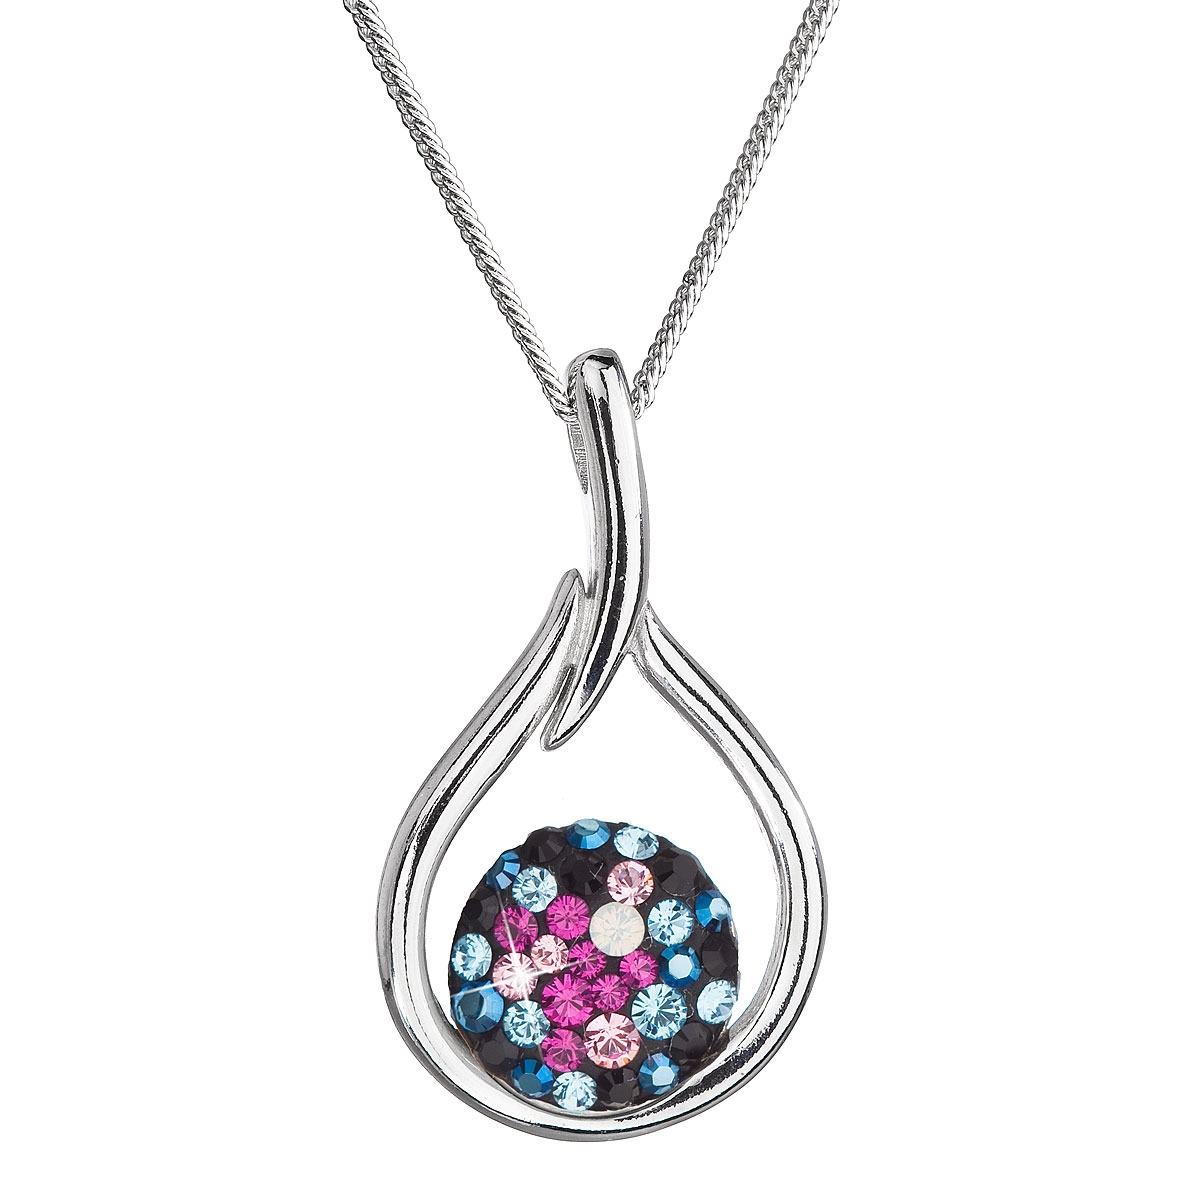 Stříbrný náhrdelník se Swarovski krystaly kapka, Galaxy EG4258-GX